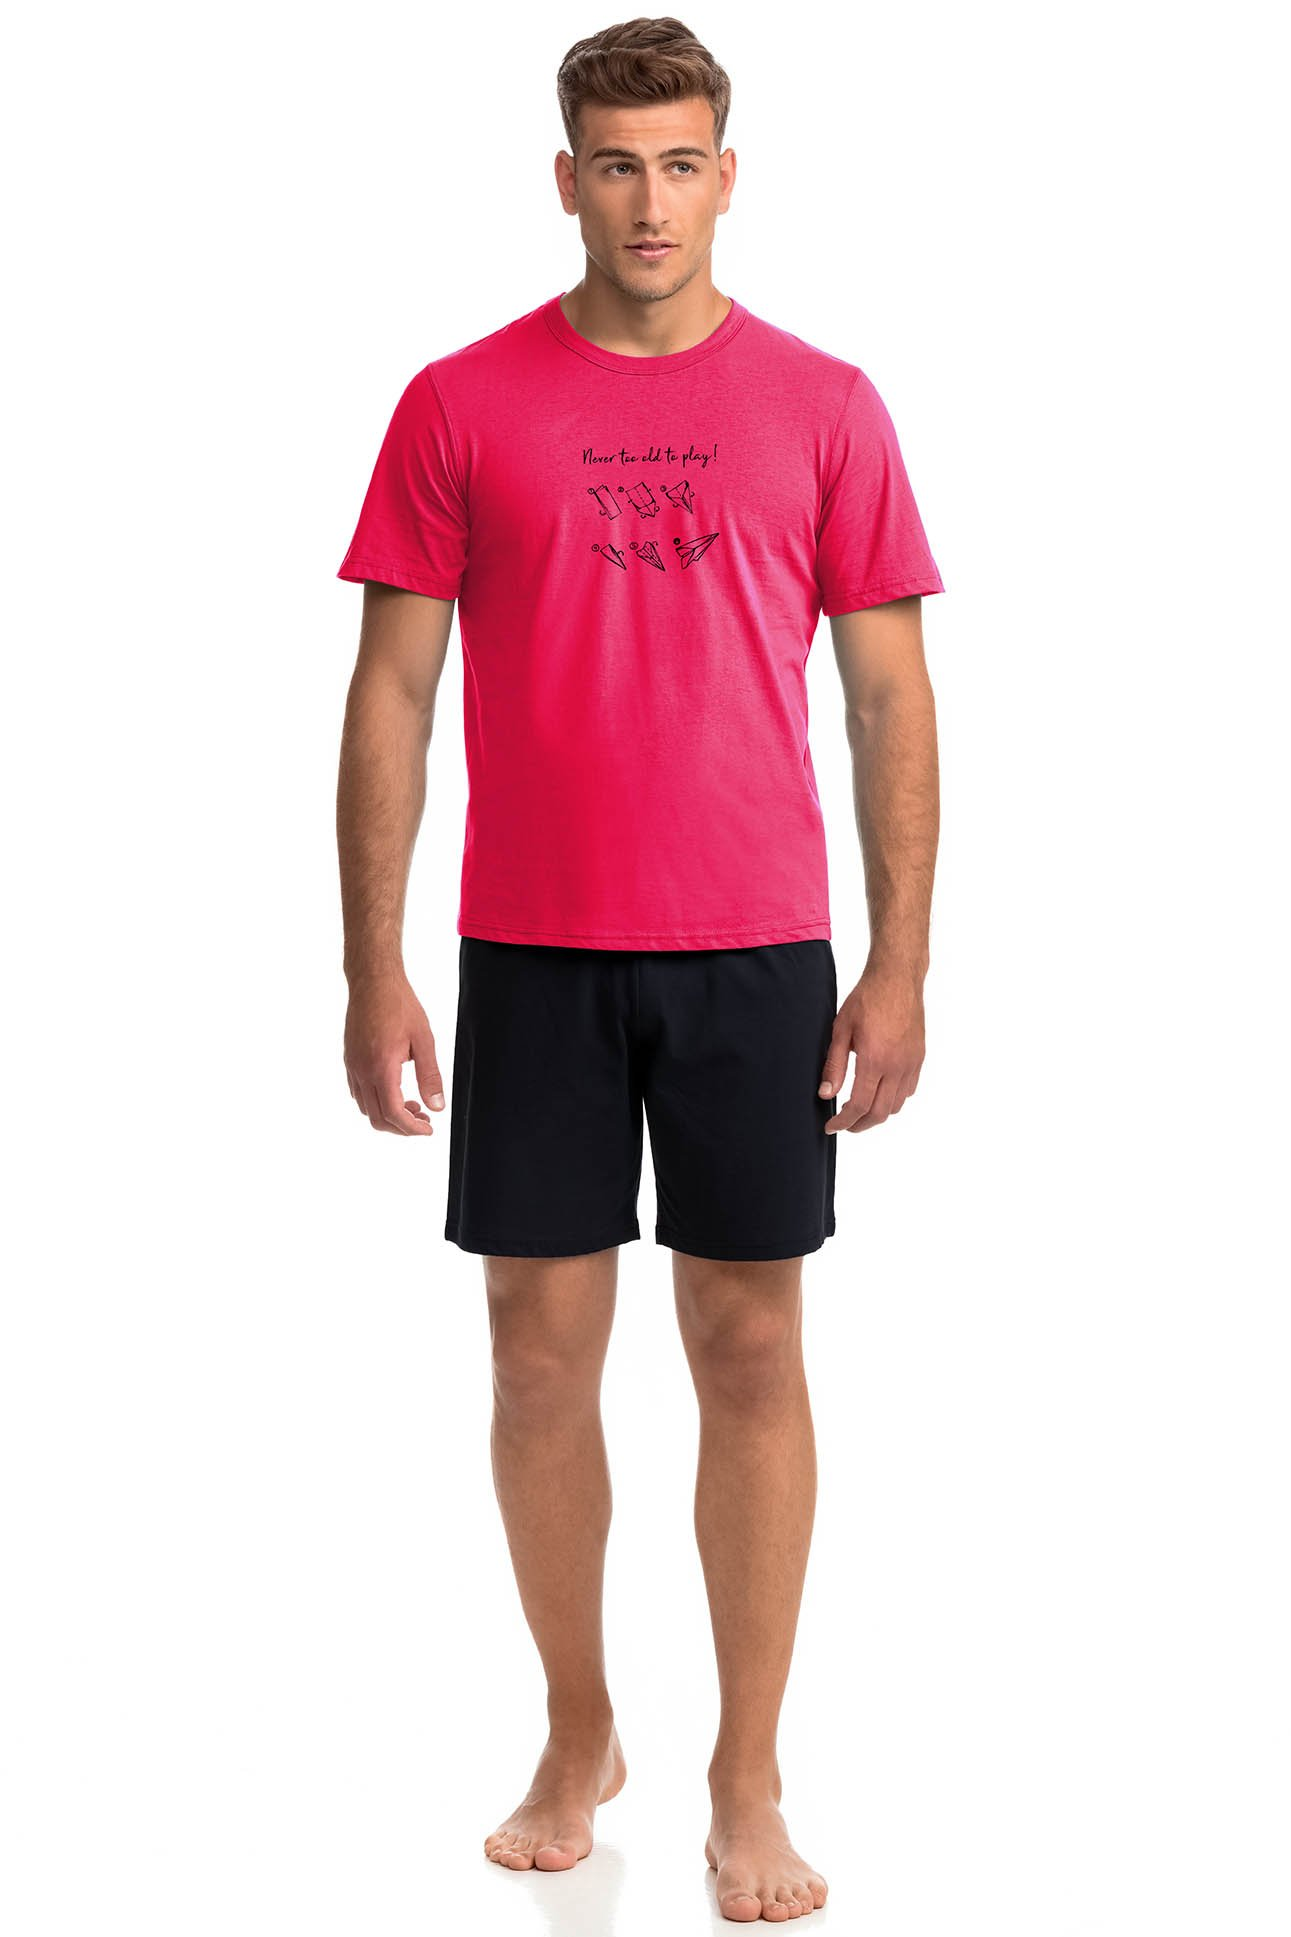 Vamp - Pohodlné dvoudílné pánské pyžamo 14935 - Vamp poppy red xl